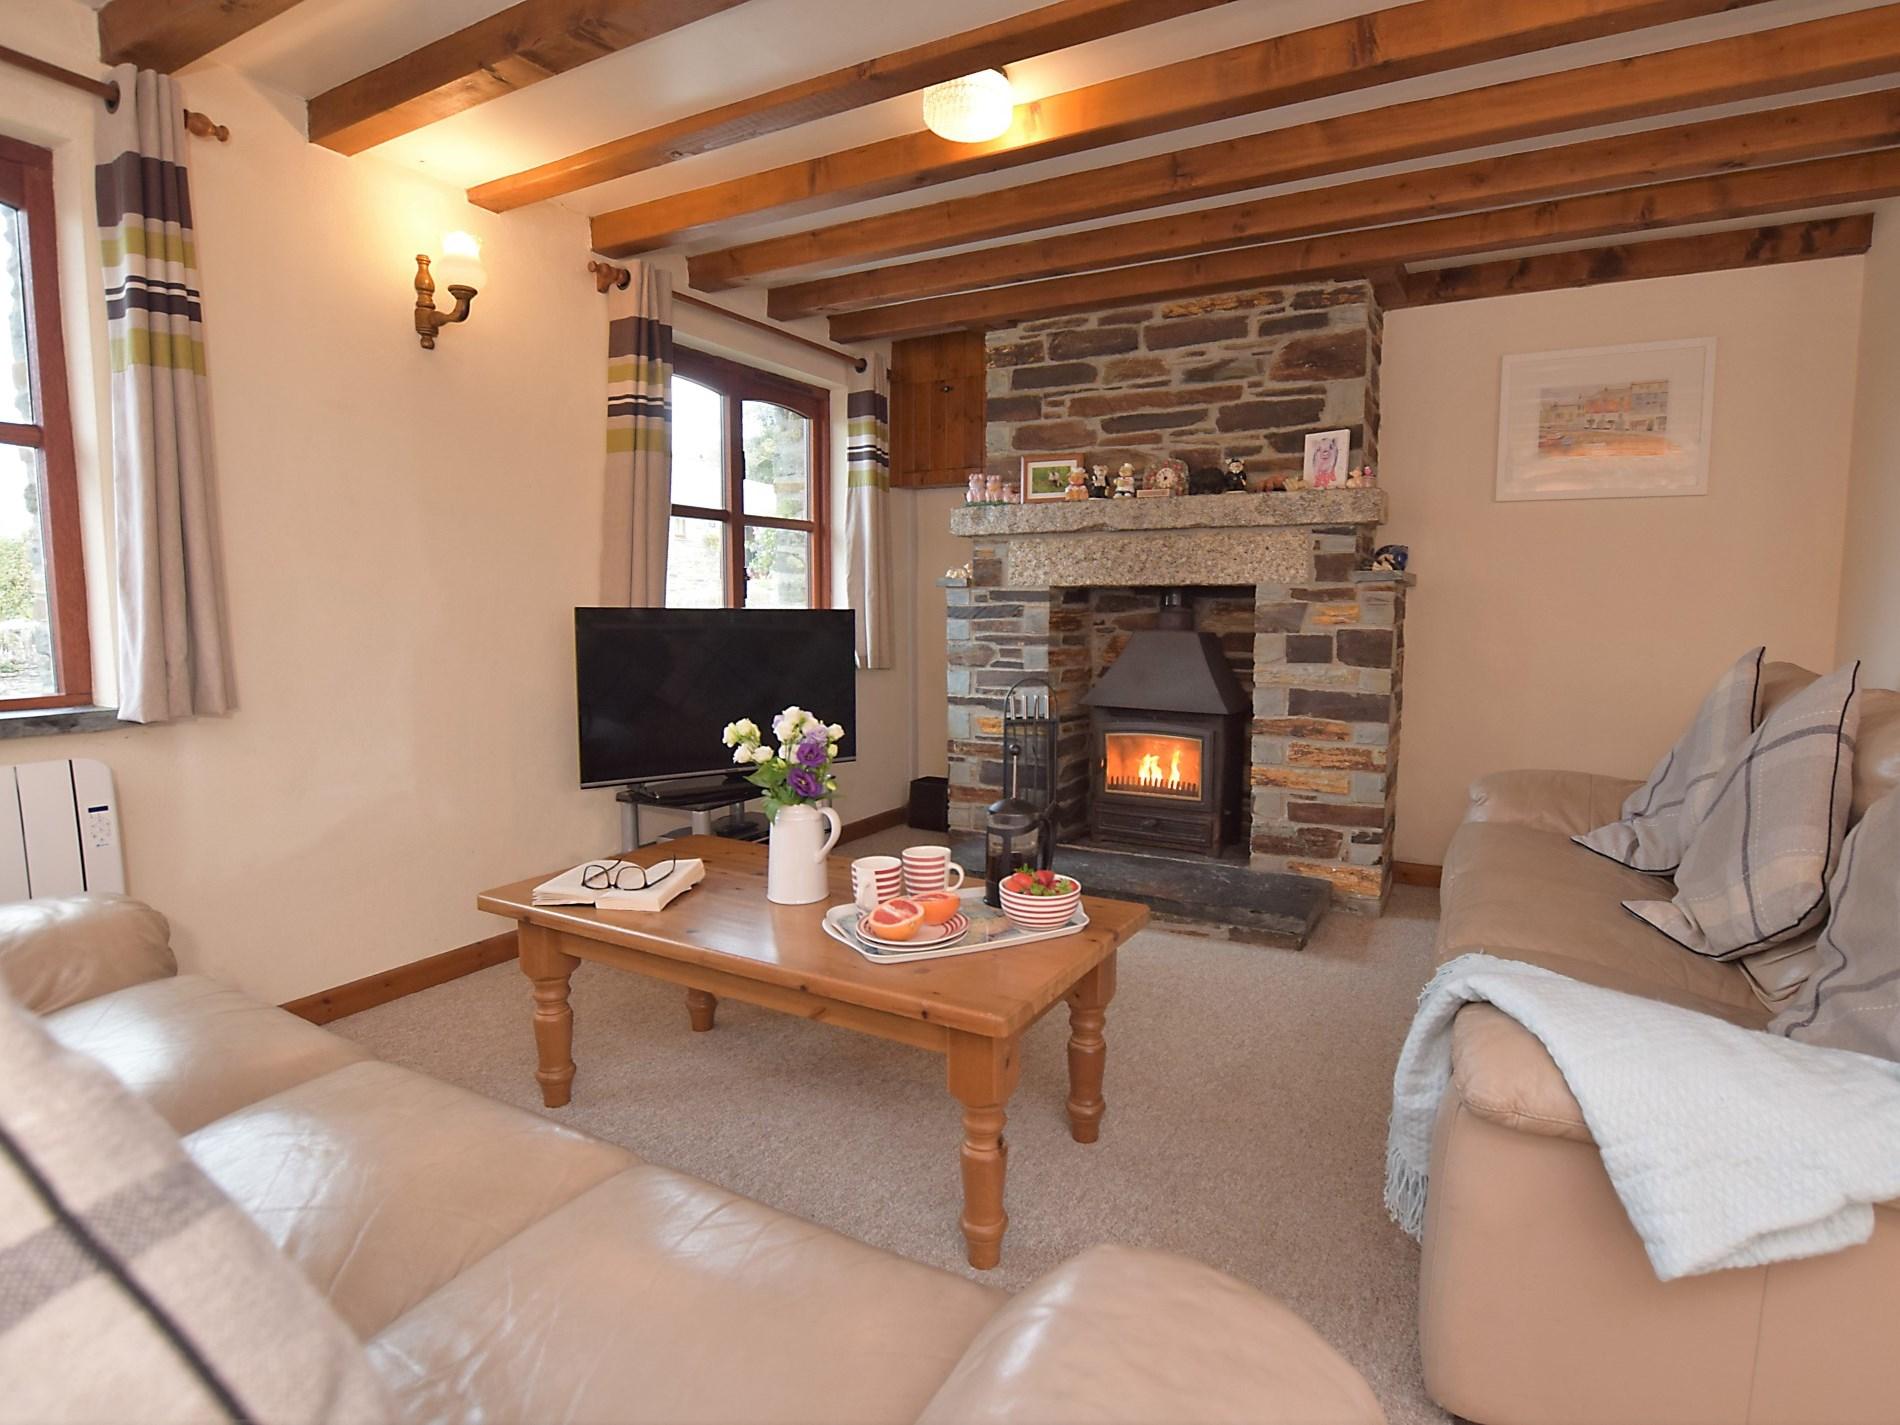 3 Bedroom Cottage in Launceston, Cornwall